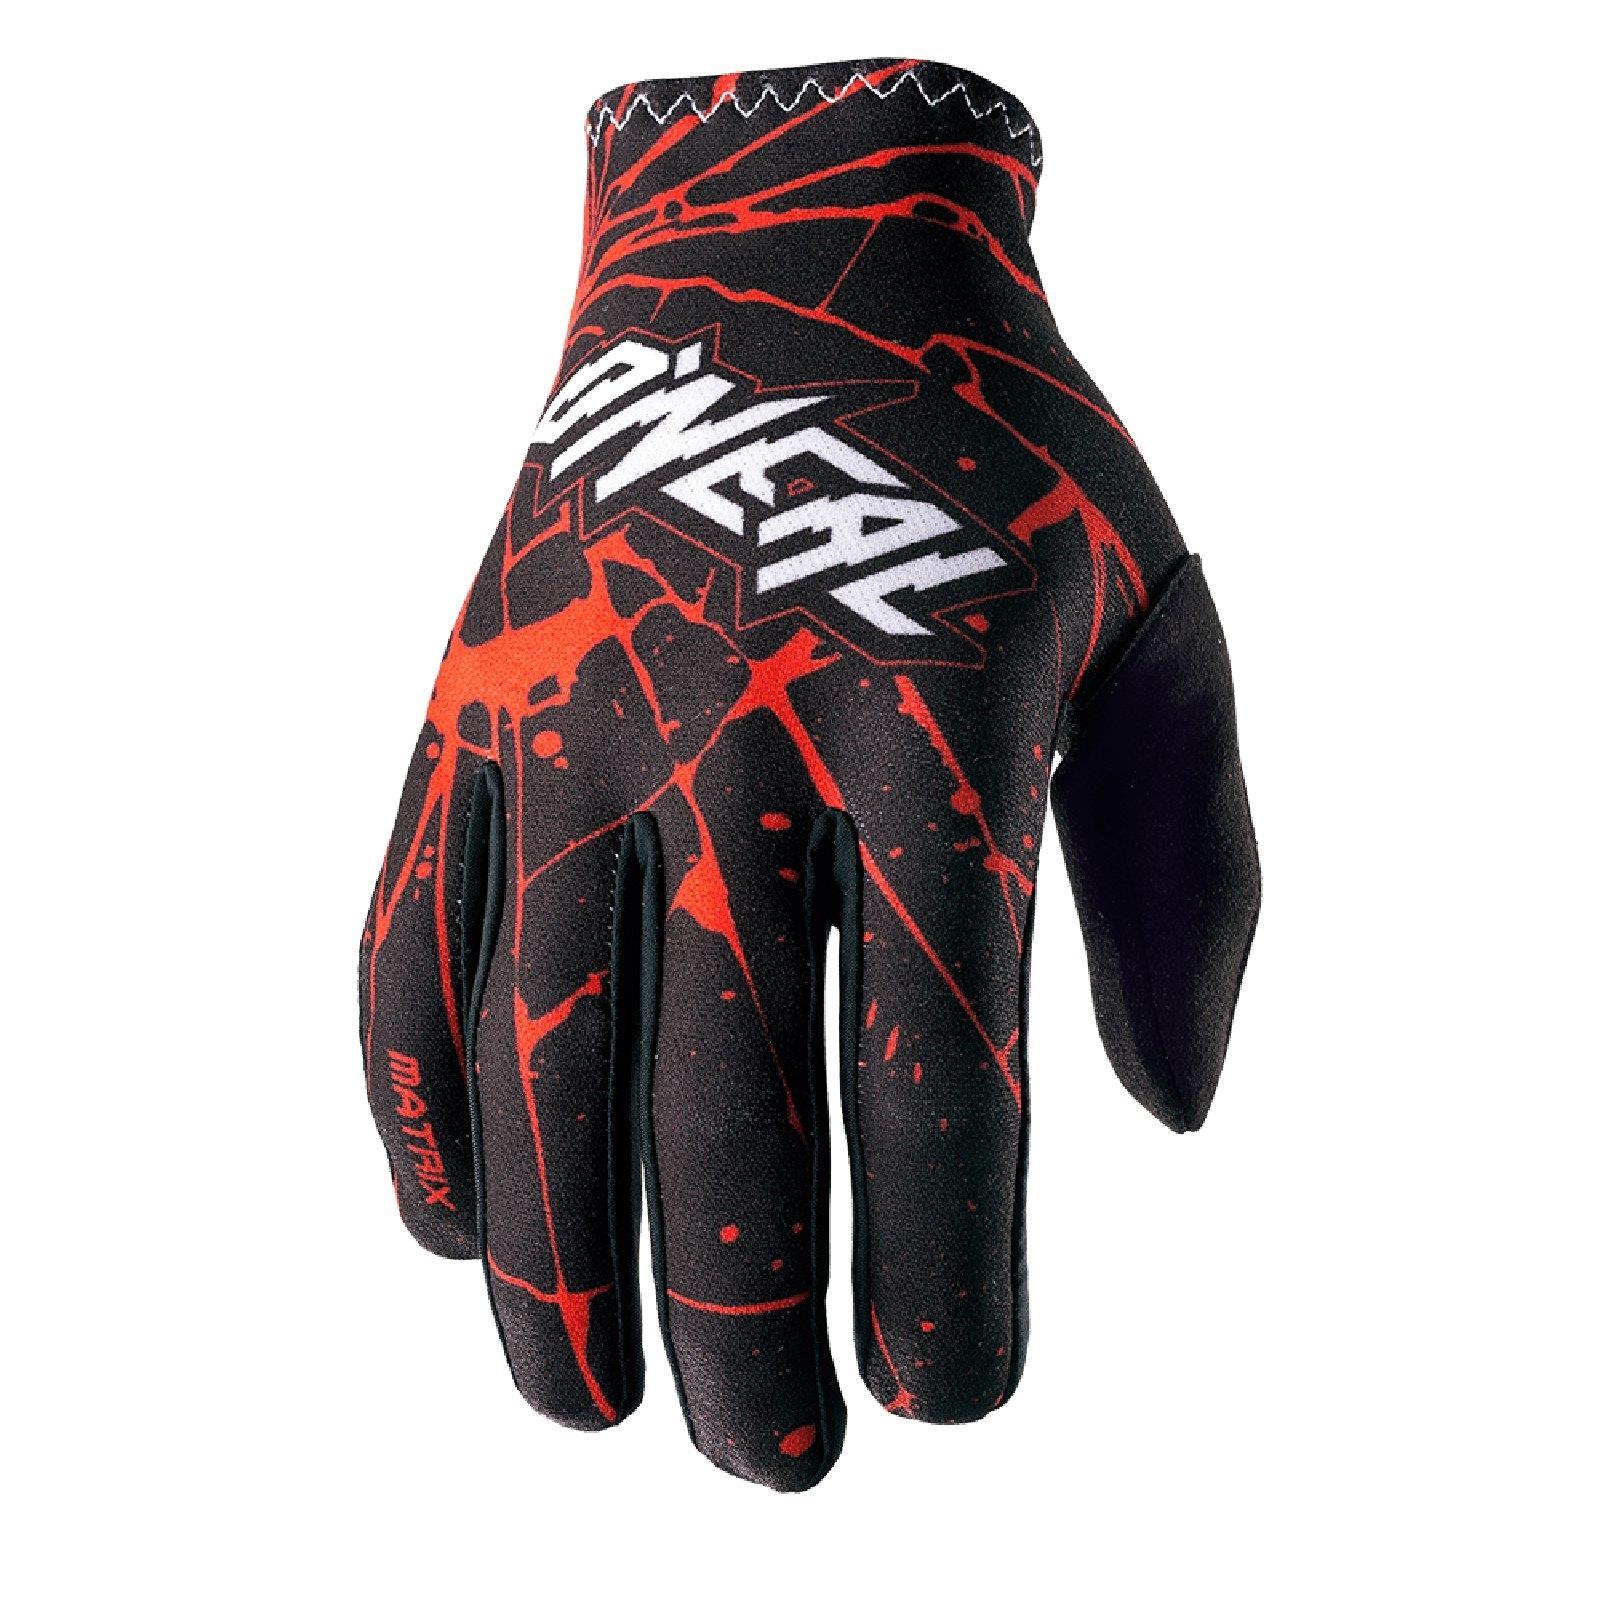 Details zu O'Neal Matrix Handschuhe Enigma Schwarz Fahrrad Downhill MTB Cross Mountainbike